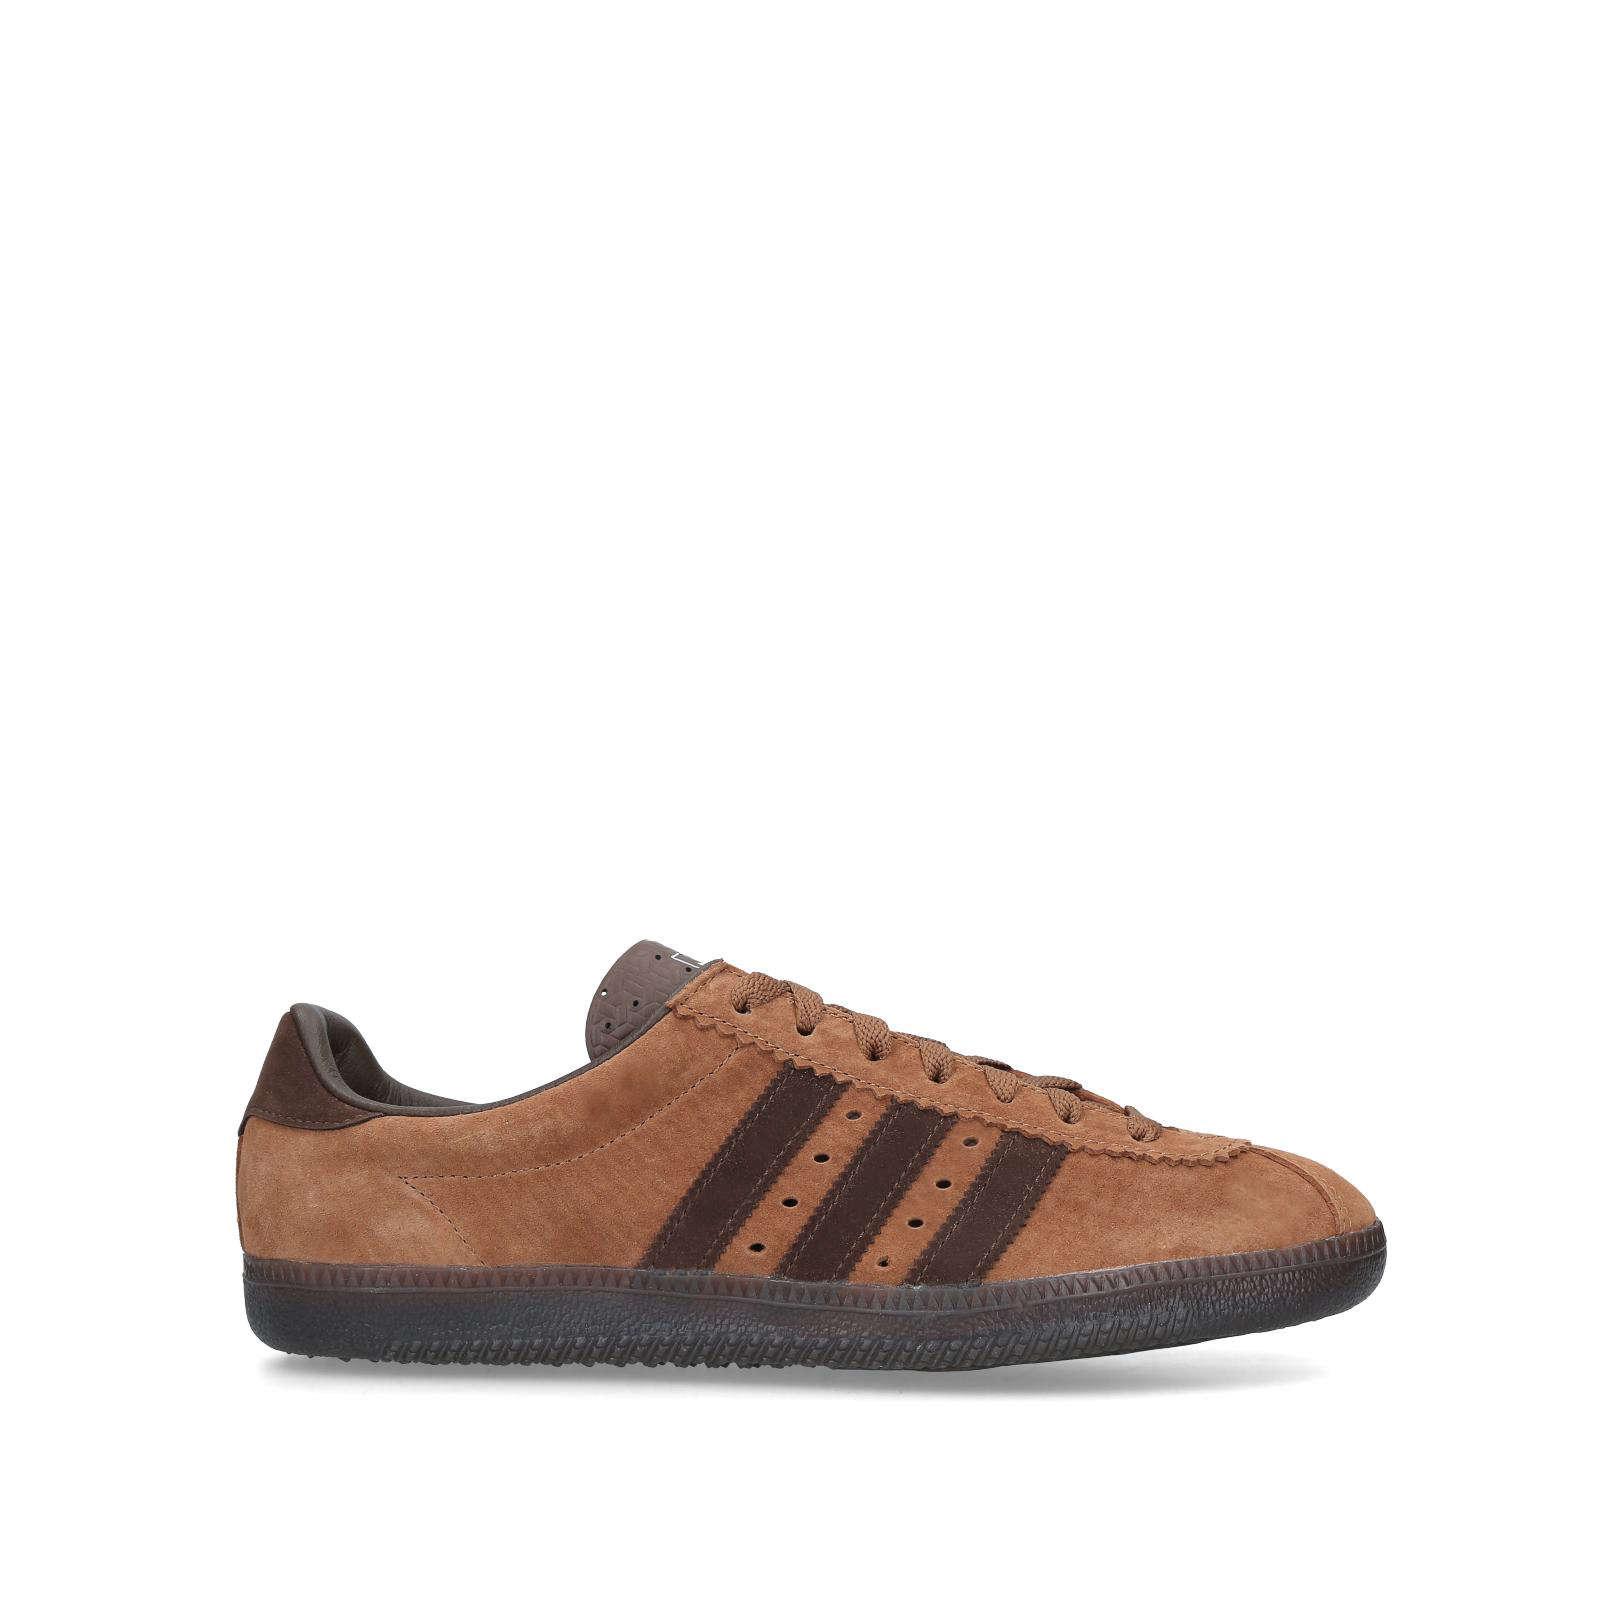 Comandante Correspondiente a Oeste  PADIHAM SPEZIAL - ADIDAS Sneakers